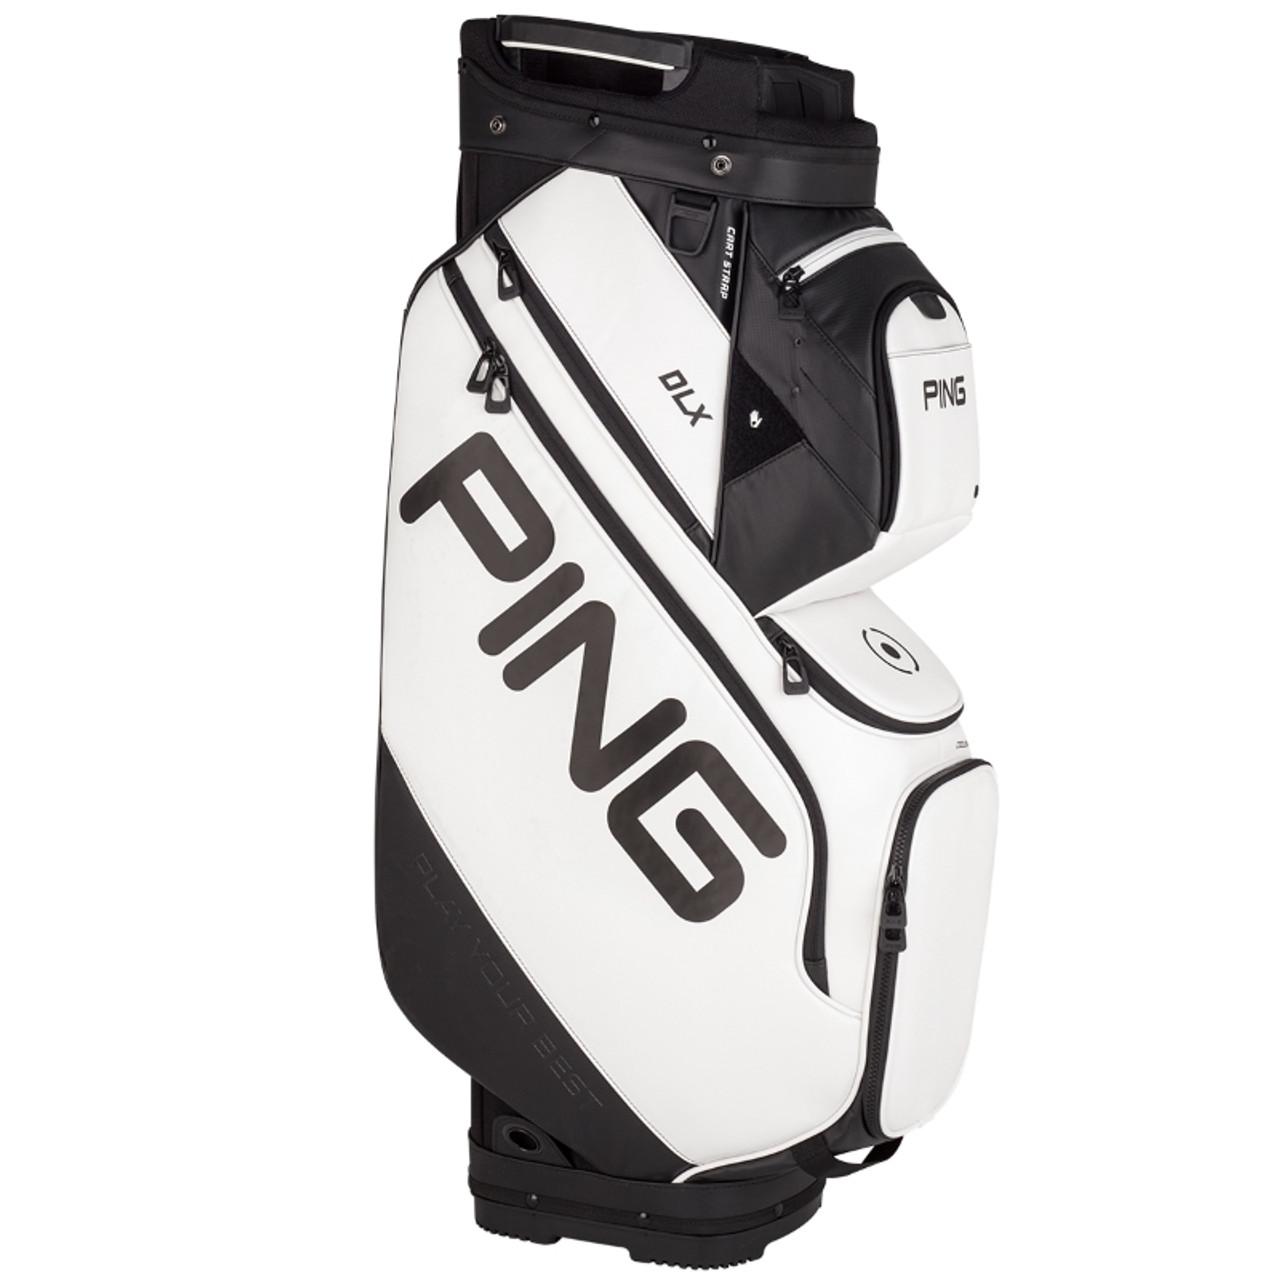 d66da629a7741 Ping Dlx Cart Bag 2019 Just Say Golfrhjustsaygolf  Golf Cart Bag Ping Golf  Bags At